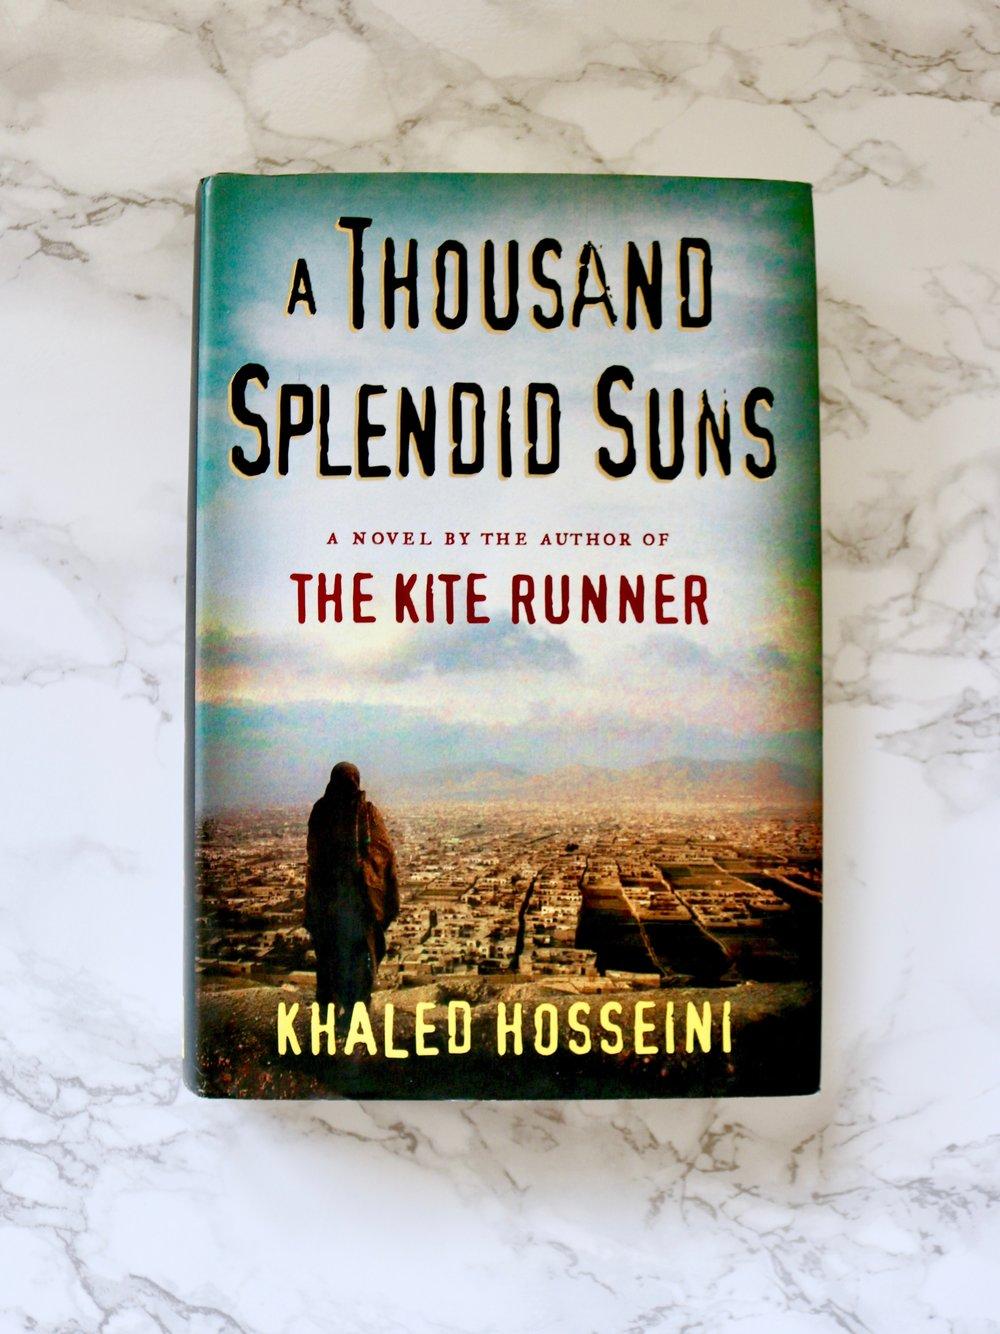 A Thousand Splendid Suns.jpg